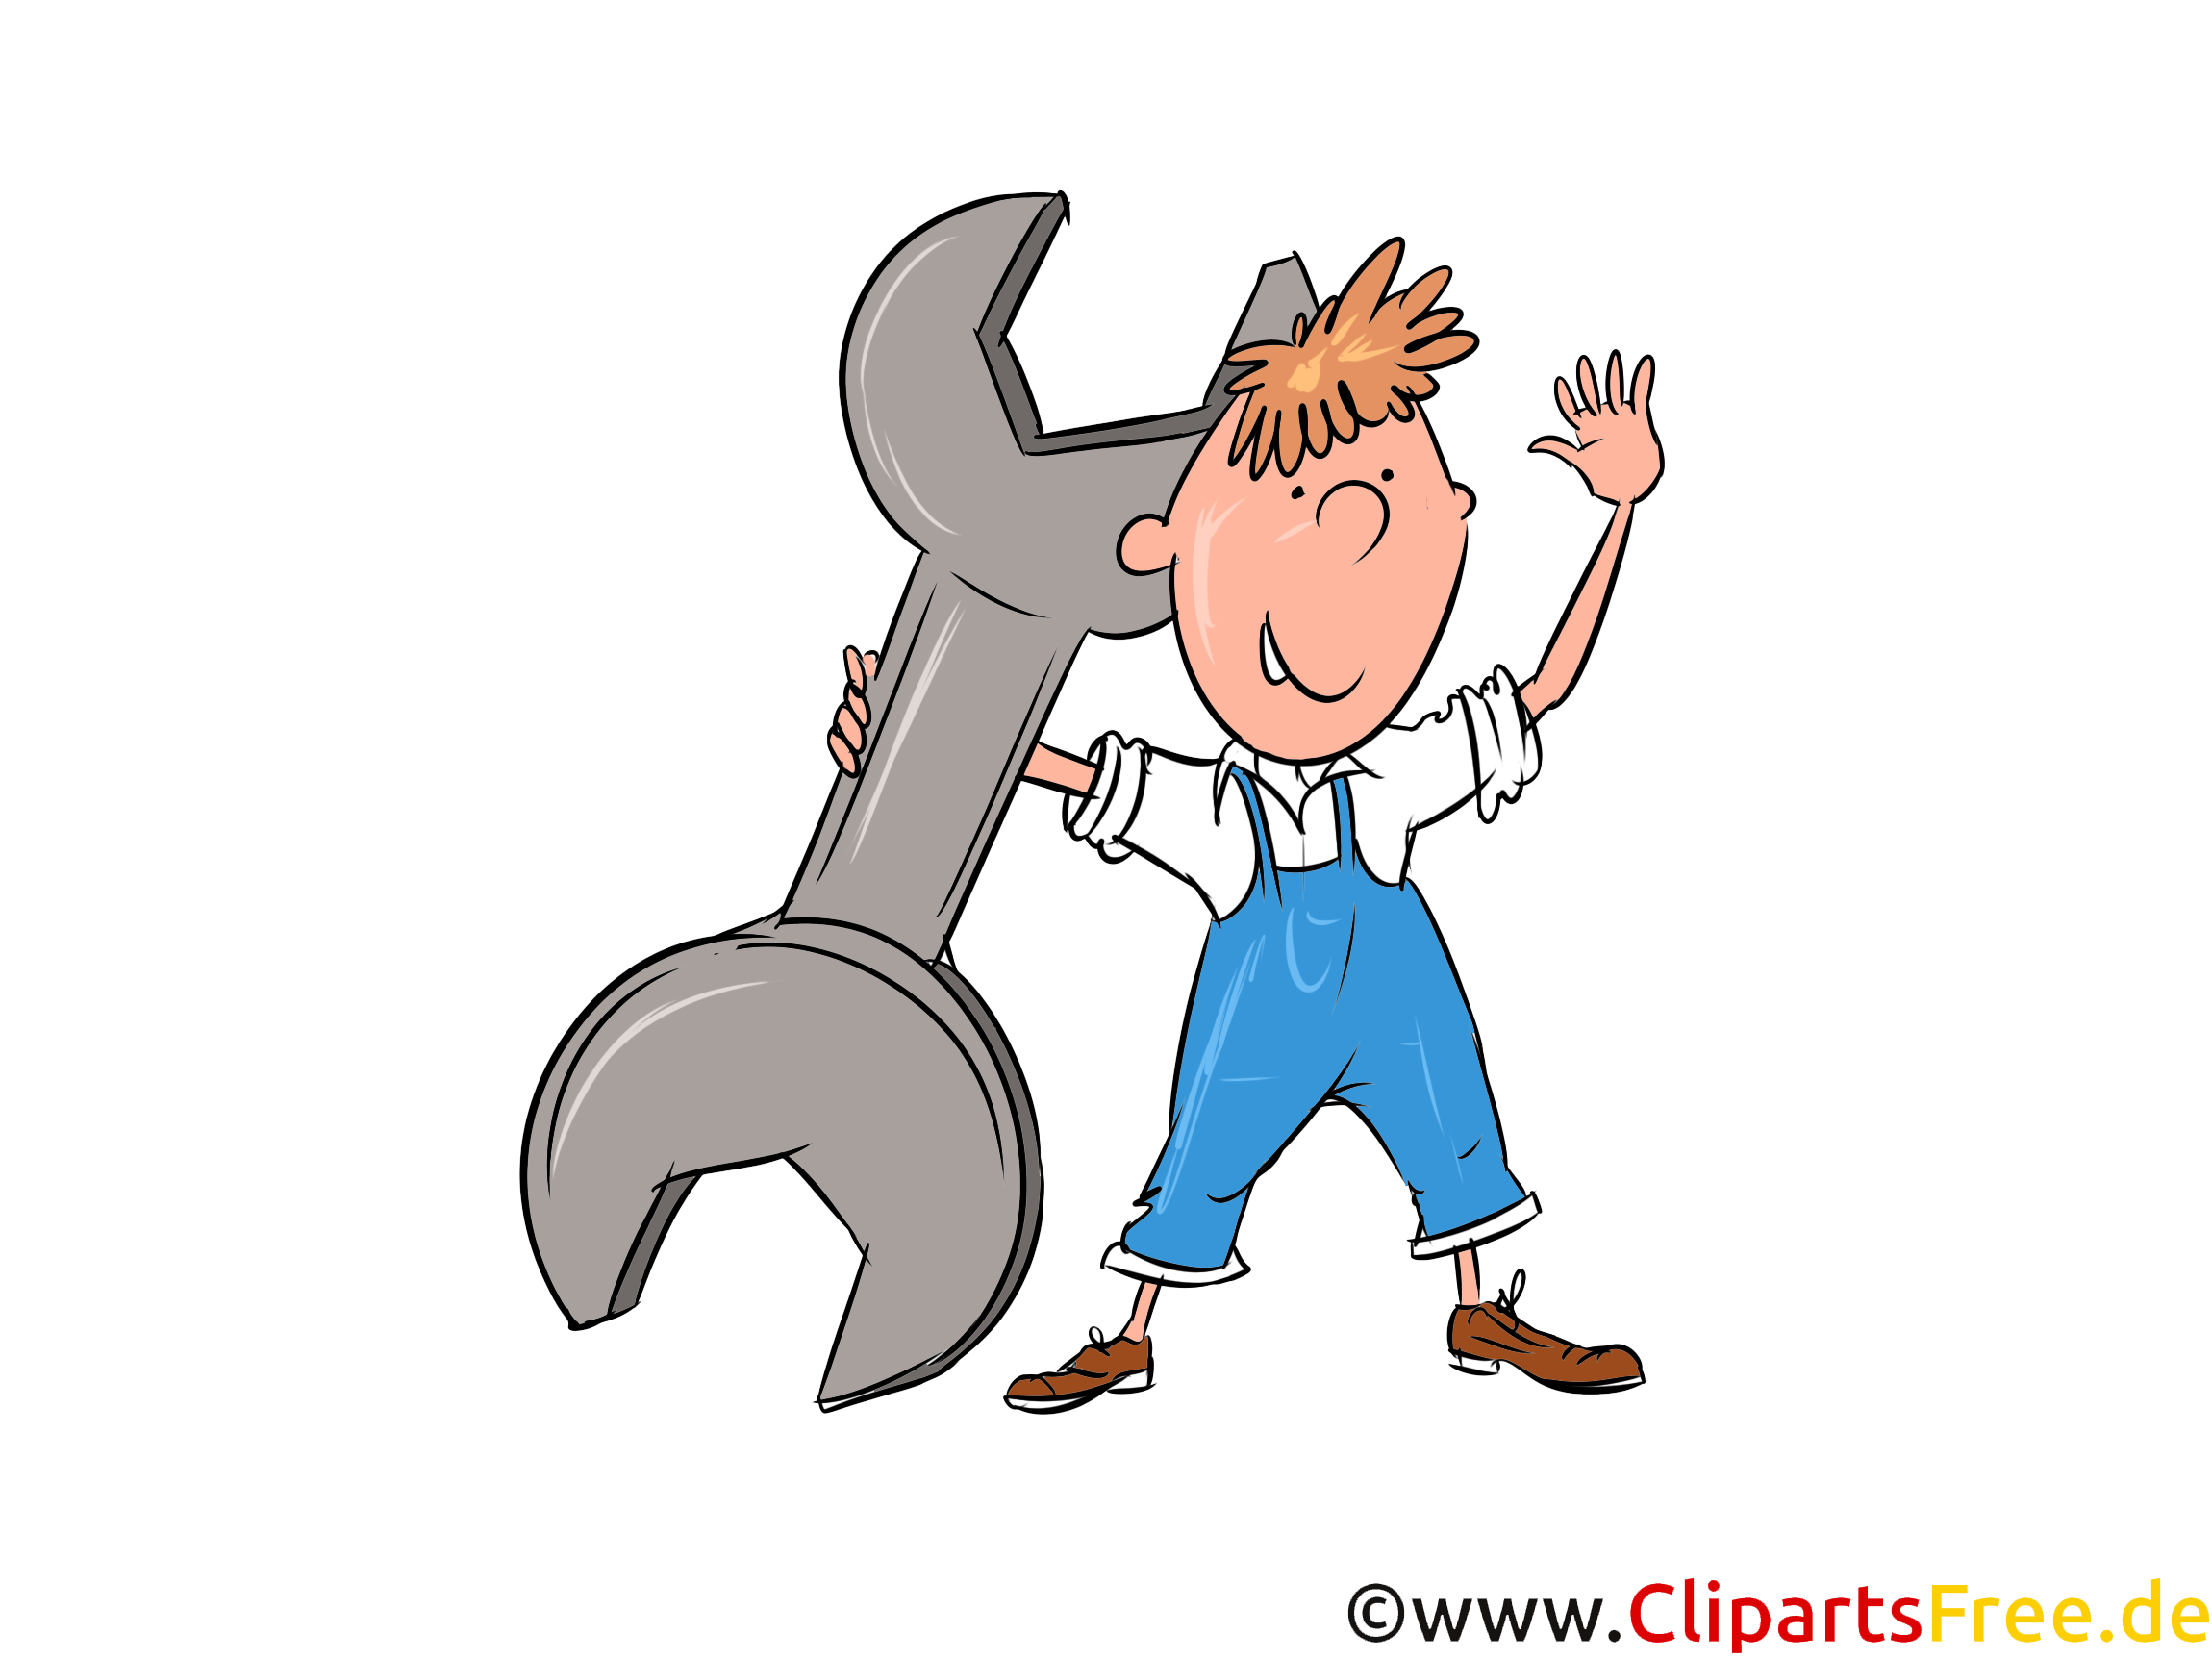 Automechaniker Bild, Illustration, Clipart, Cartoon gratis